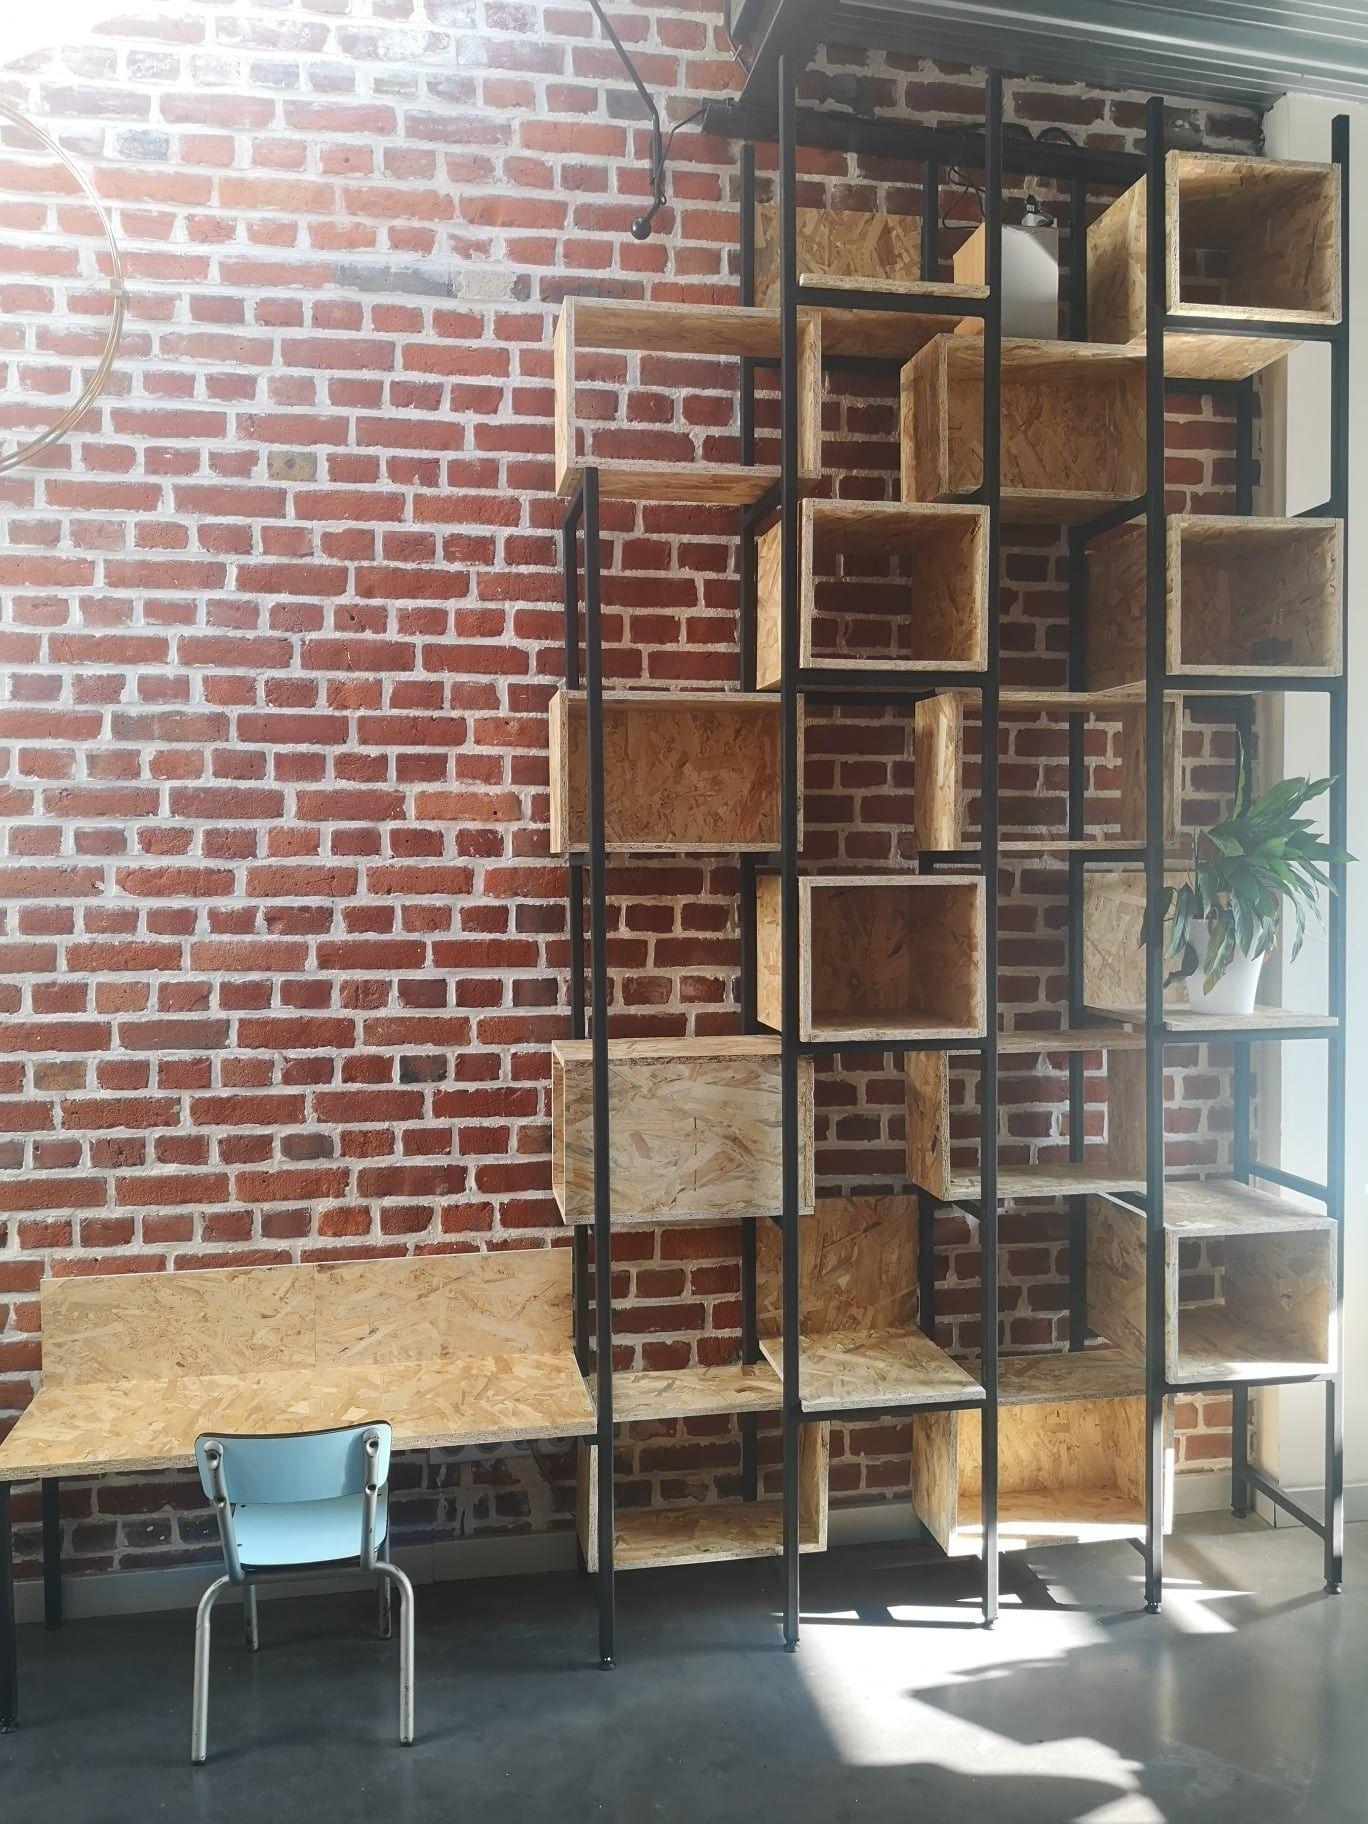 #bibliothèque #homemade #osb #metal #industriel #decorationinterieur #deco #briques